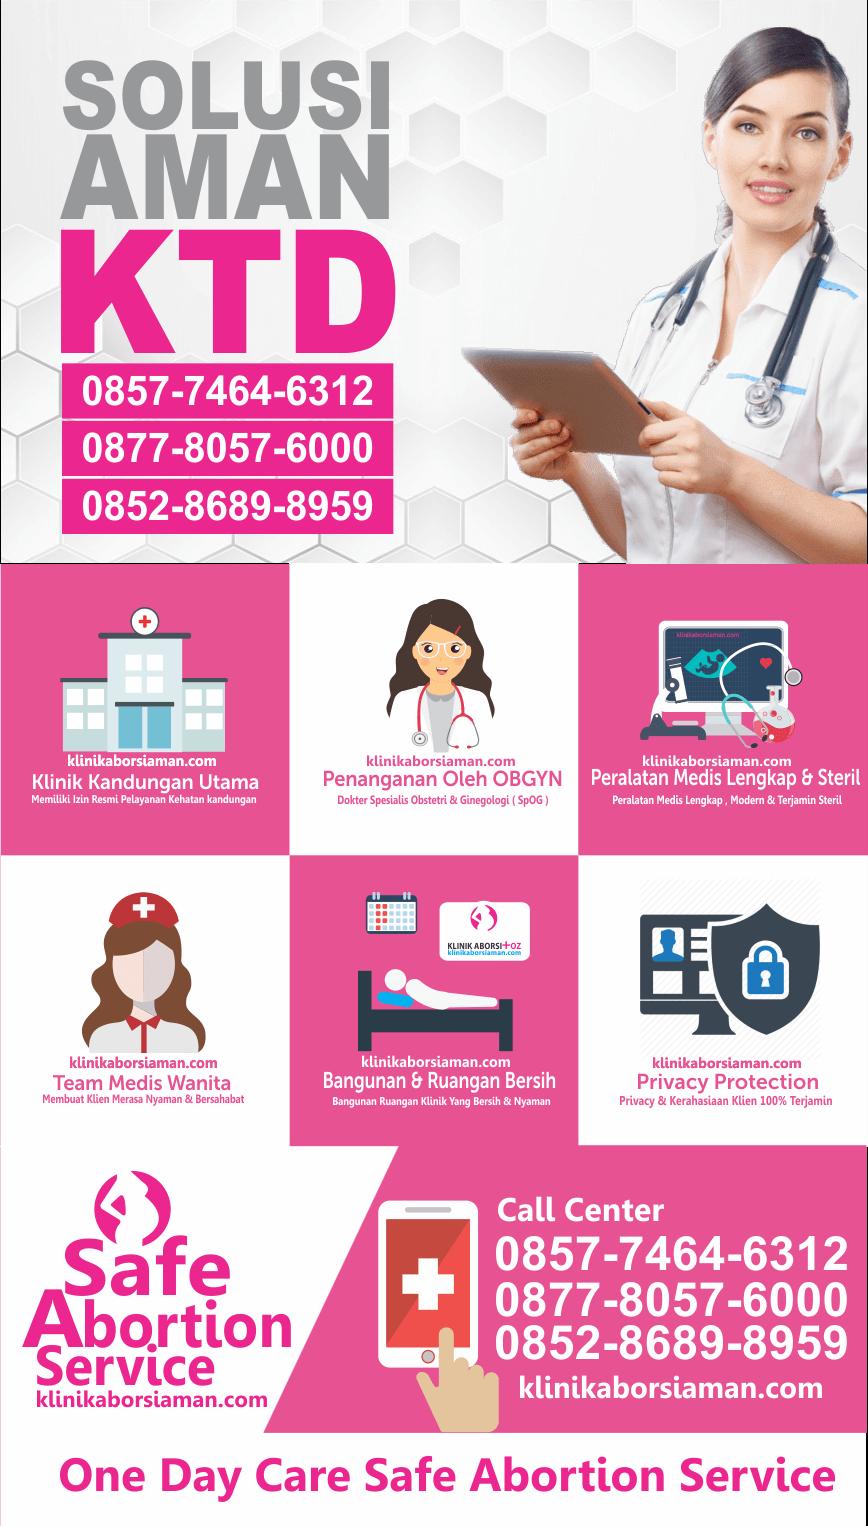 Klinik Aborsi Aman - Klinik Aborsi Legal - Klinik Kuret Aman - Tempat Kuret Steril - Tempat Aborsi Aman - Klinik Aborsi Steril - Klinik Aborsi Jakarta - Klinik Aborsi Resmi